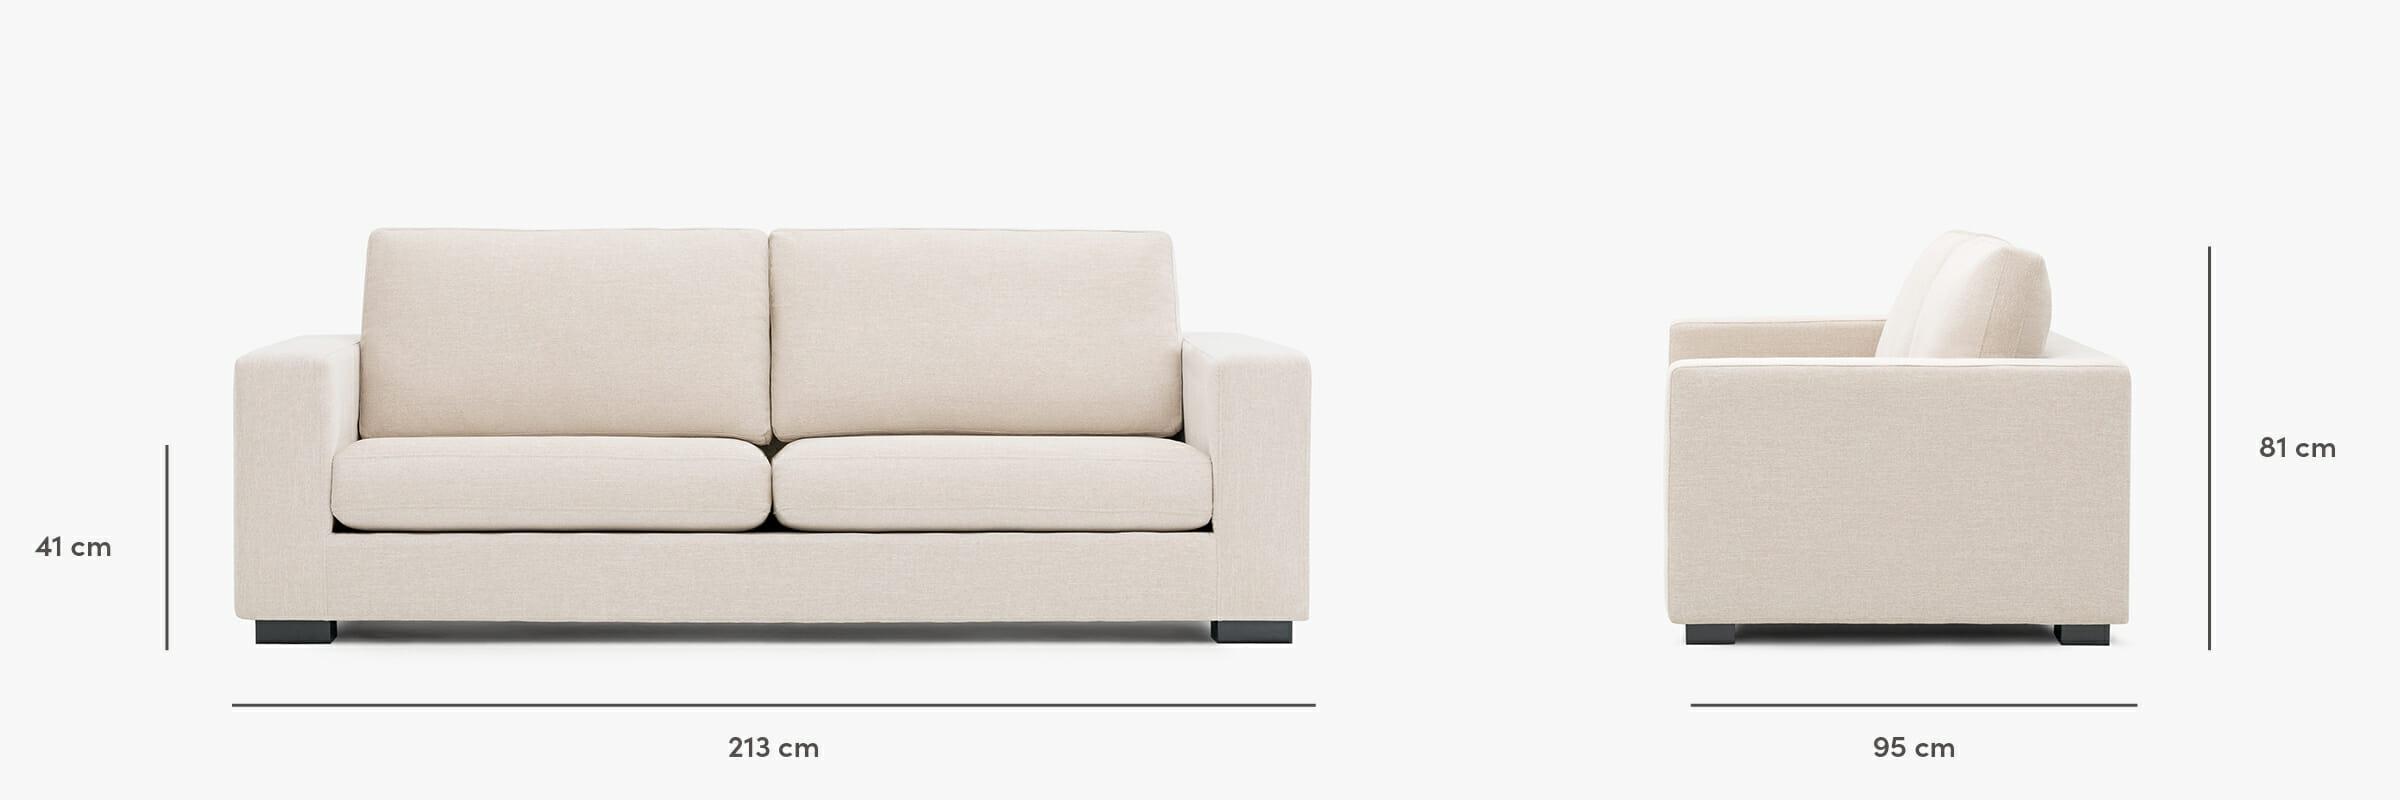 The malibu sofa dimensions